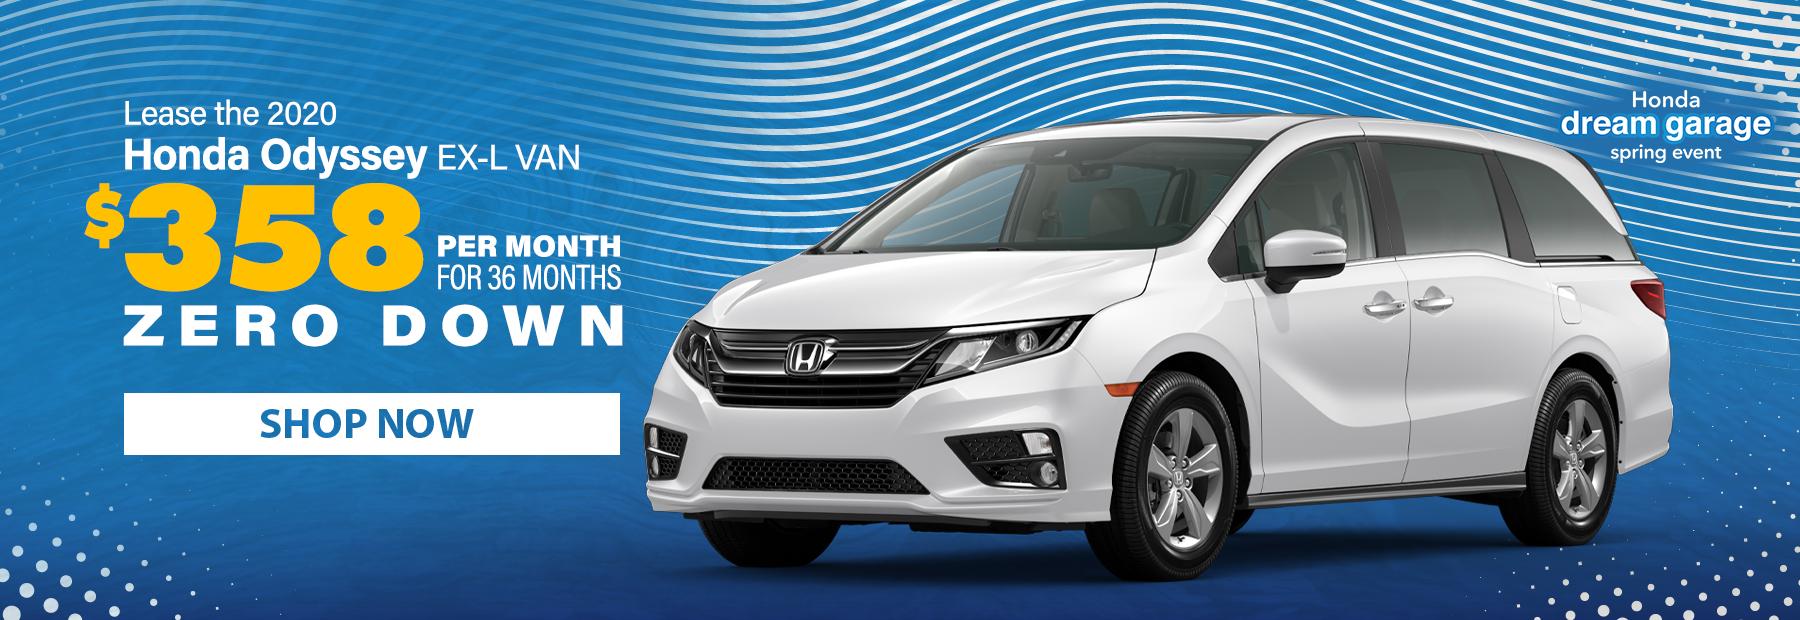 New 2020 Honda Odyssey Minivan Lease Deals in Cincinnati, OH